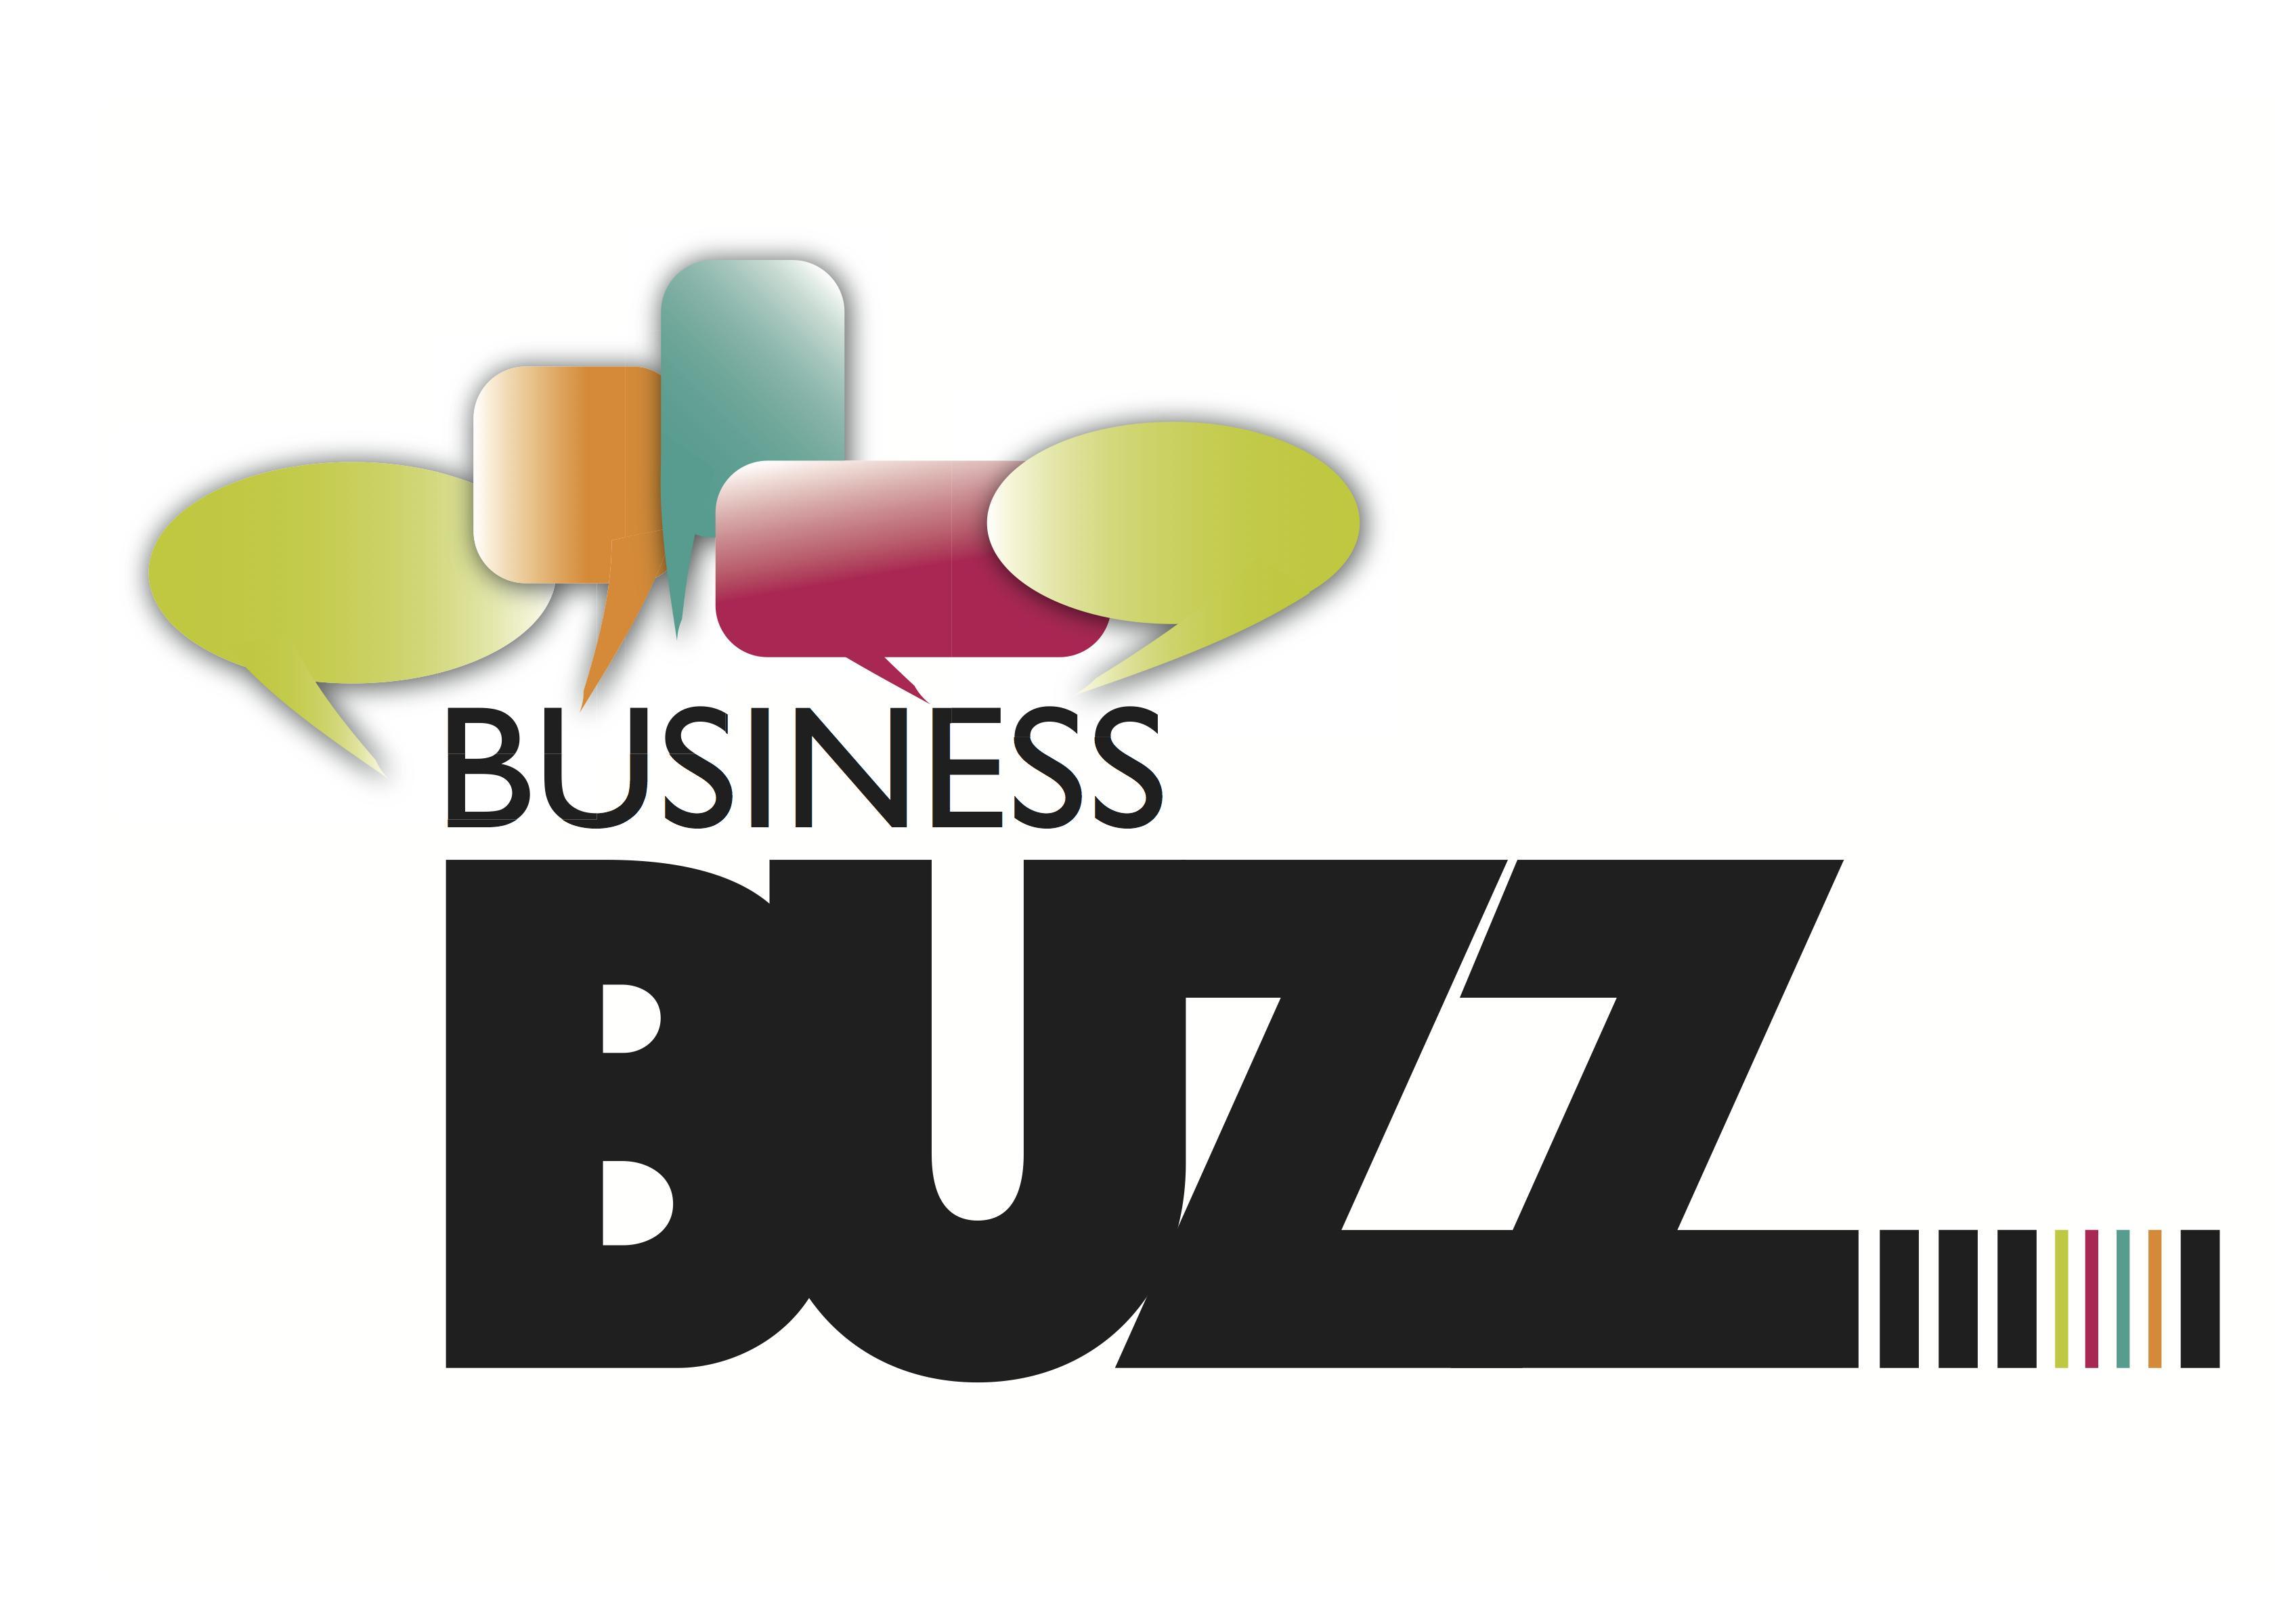 Business BUZZ - St Albans